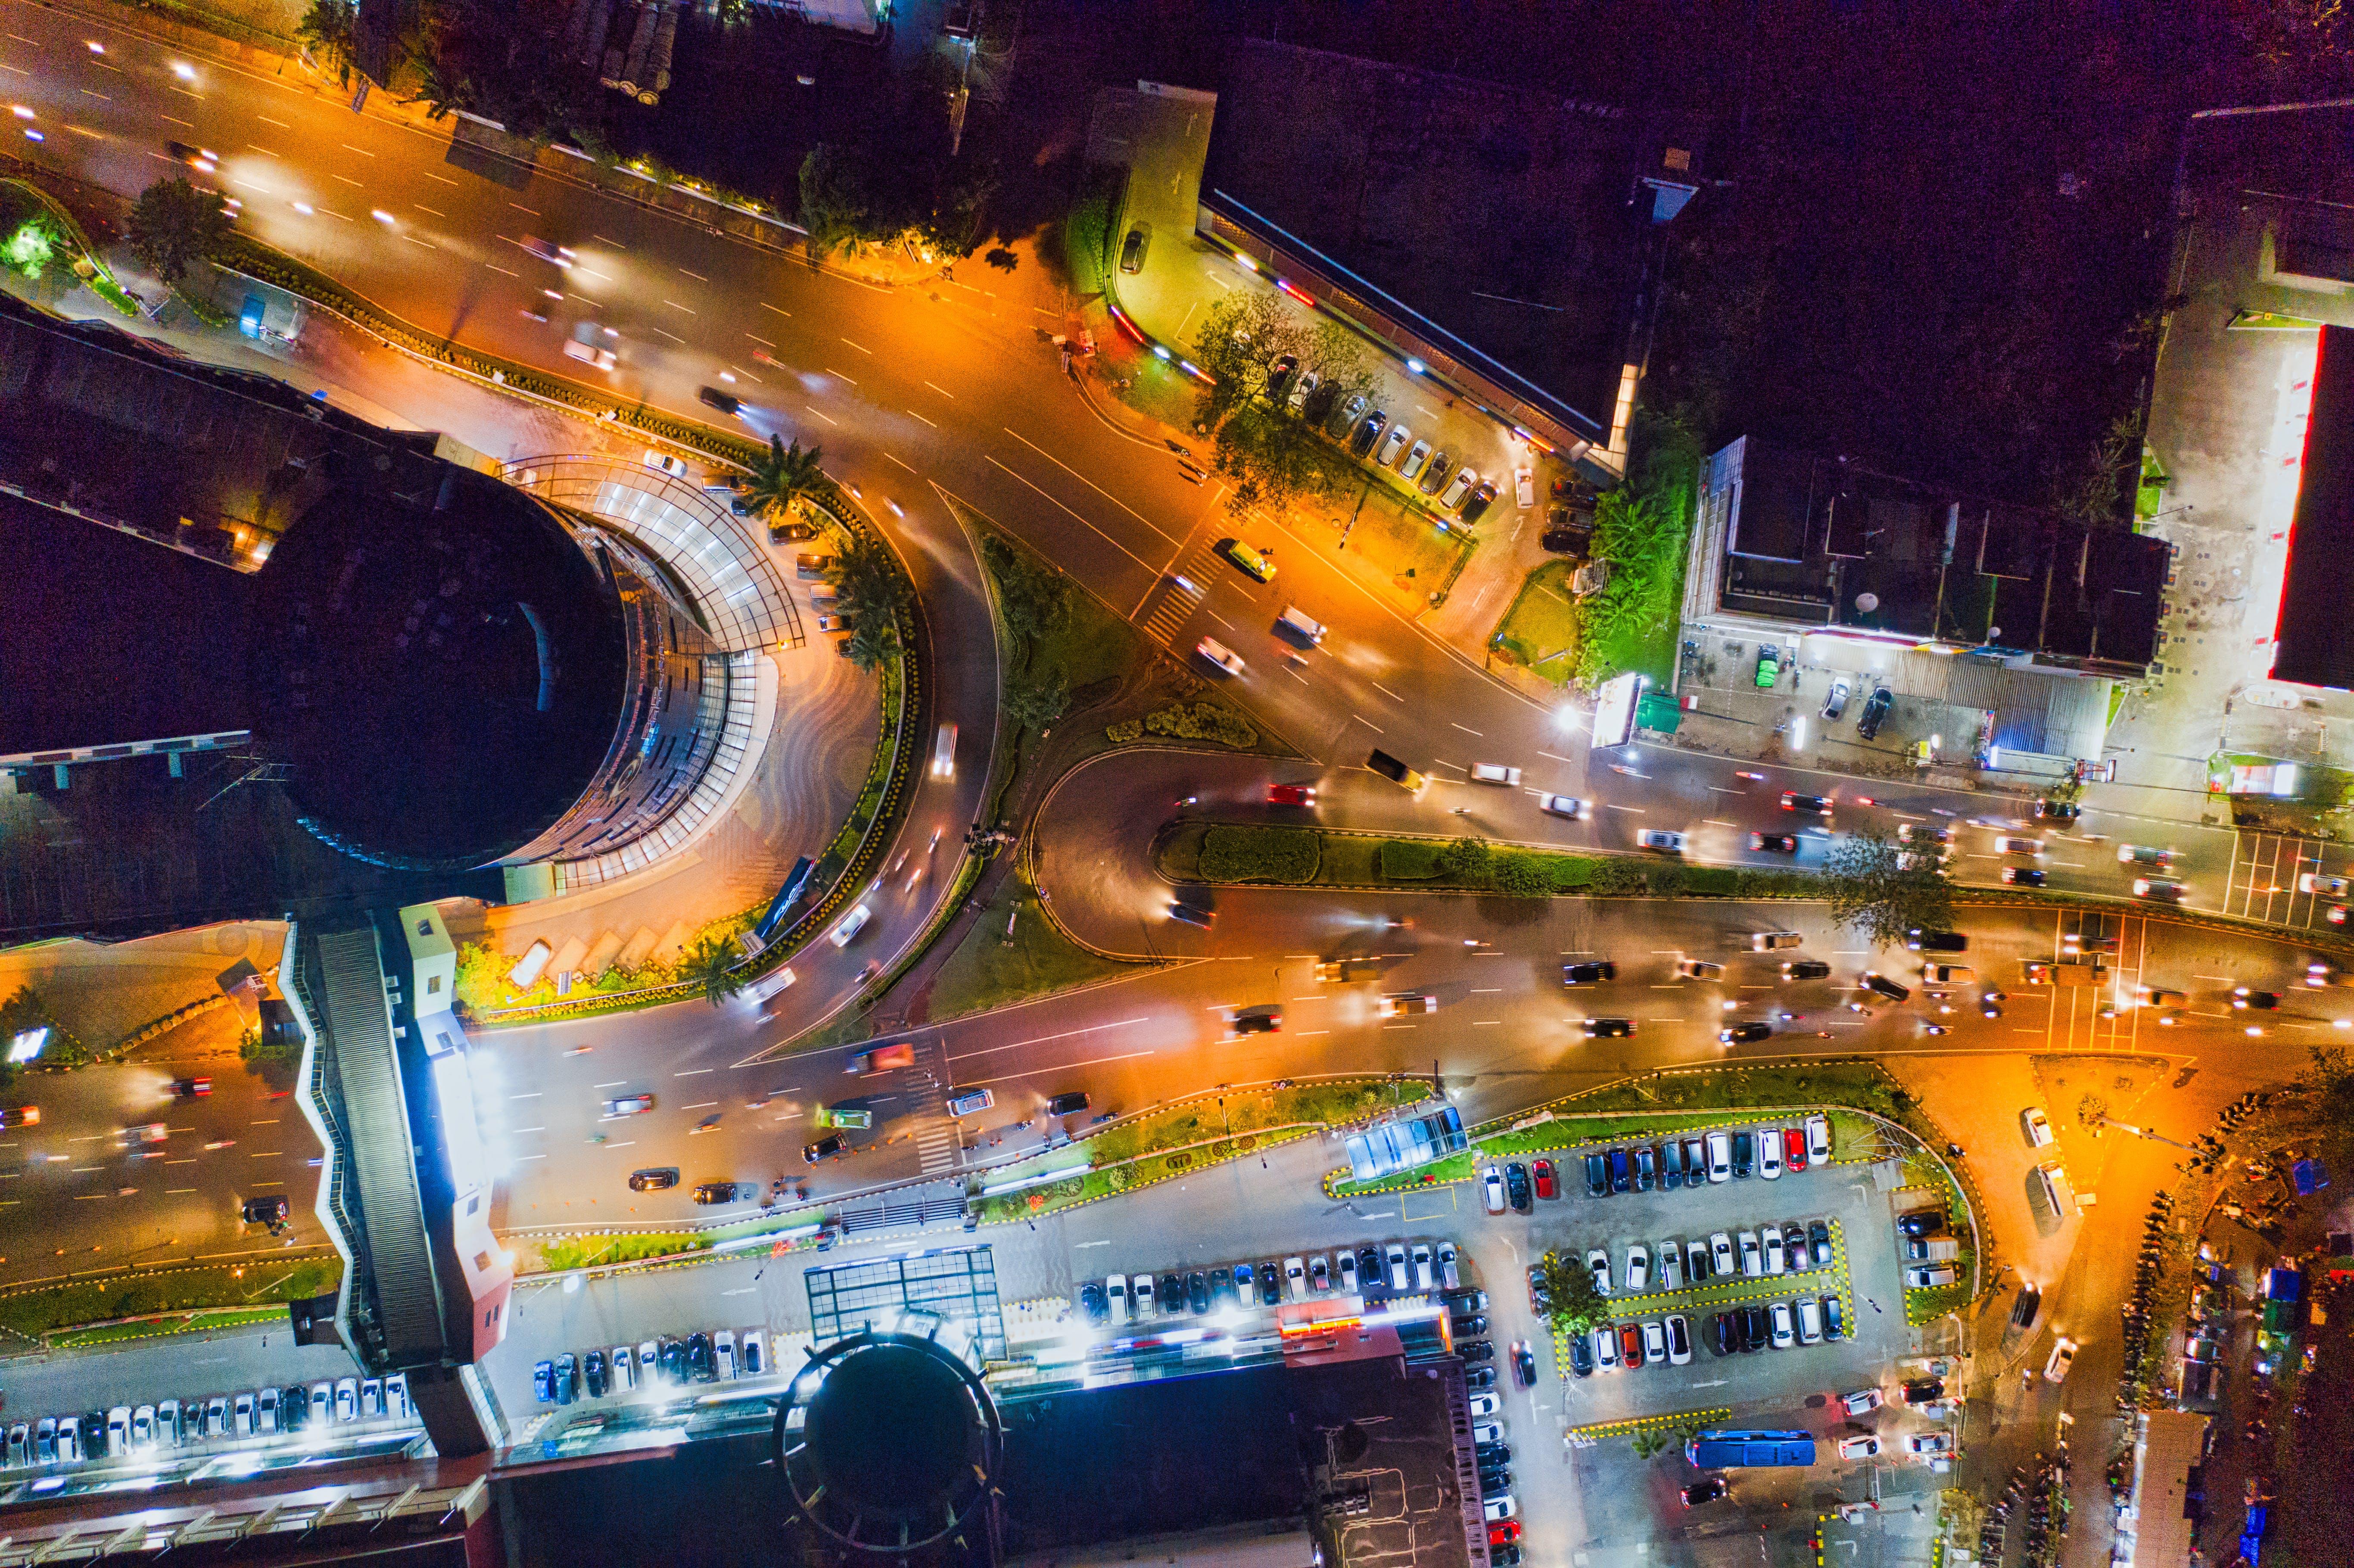 of aerial, architecture, blur, building